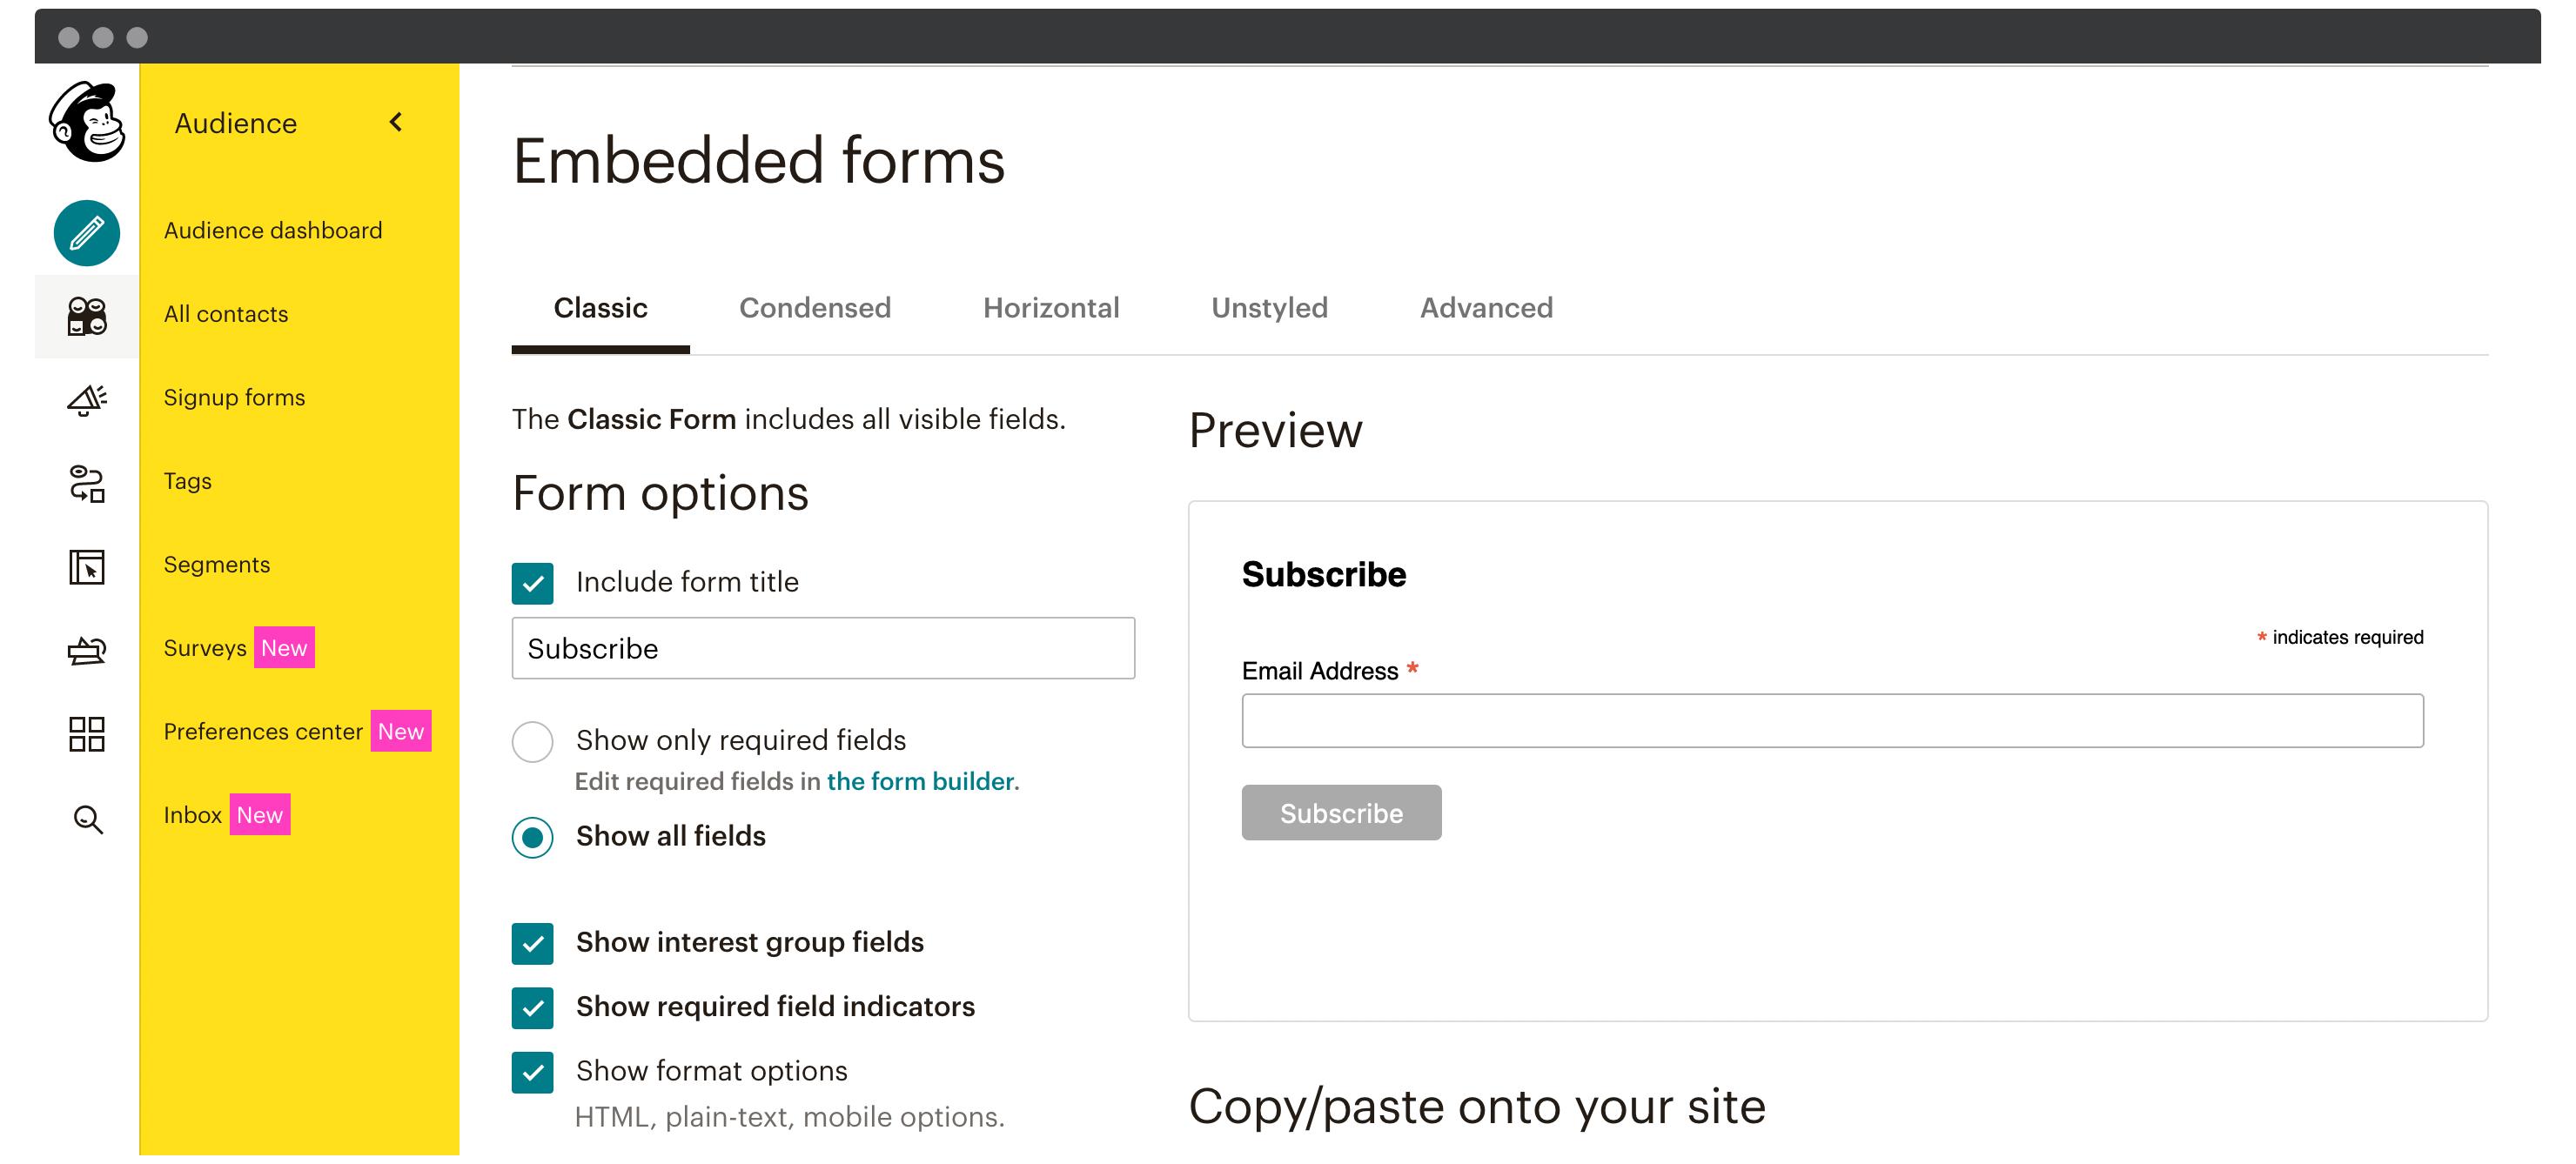 Mailchimp's form embedding options.